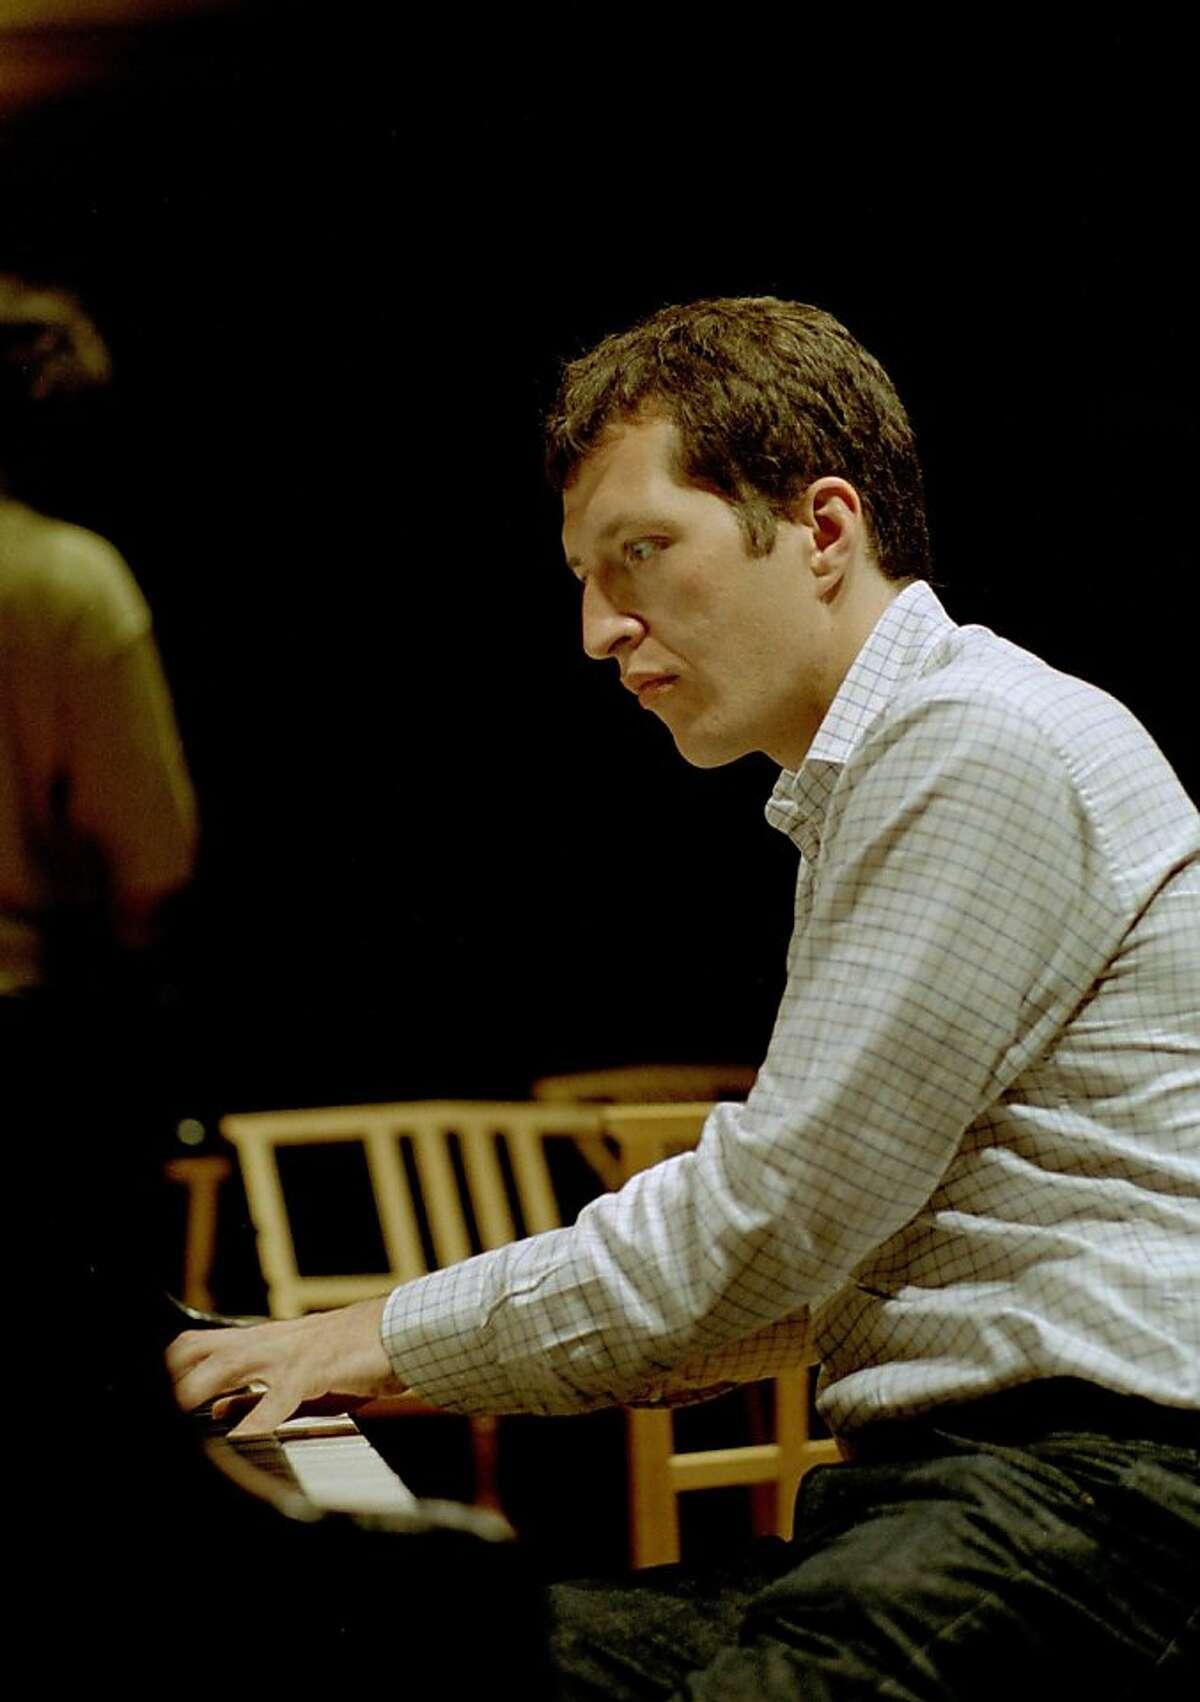 Pianist-composer Thomas Adès Ran on: 03-18-2010 Thomas Adès performed a concert paraphrase.